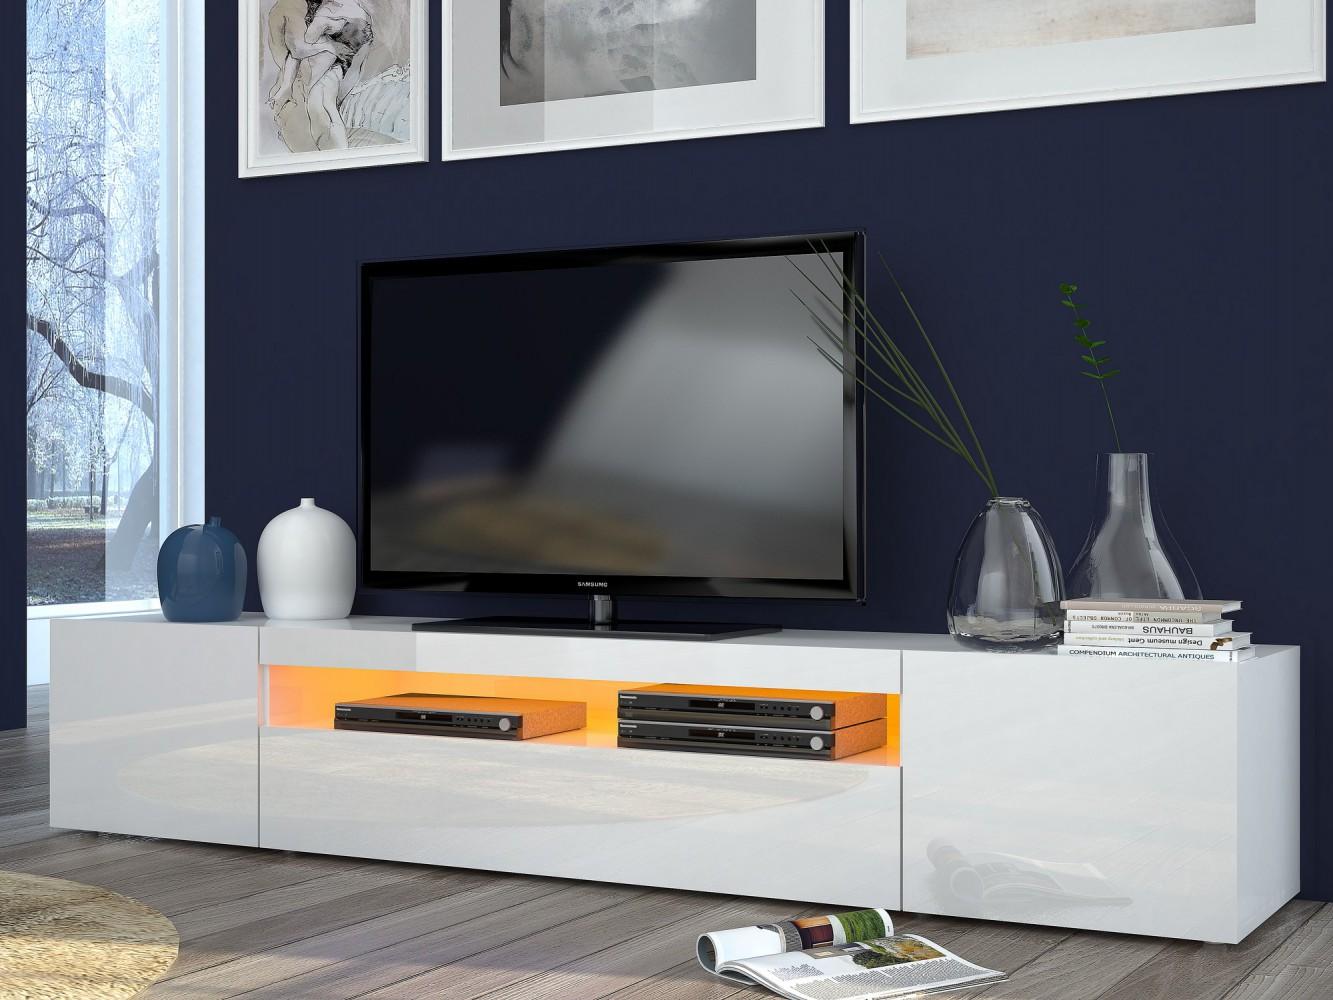 Erstaunlich Sideboard Weiß Hochglanz 200 Cm Beste Wahl Tecnos-daiquiri-lowboard-200cm-wohnwand-mediawand-italian-design-